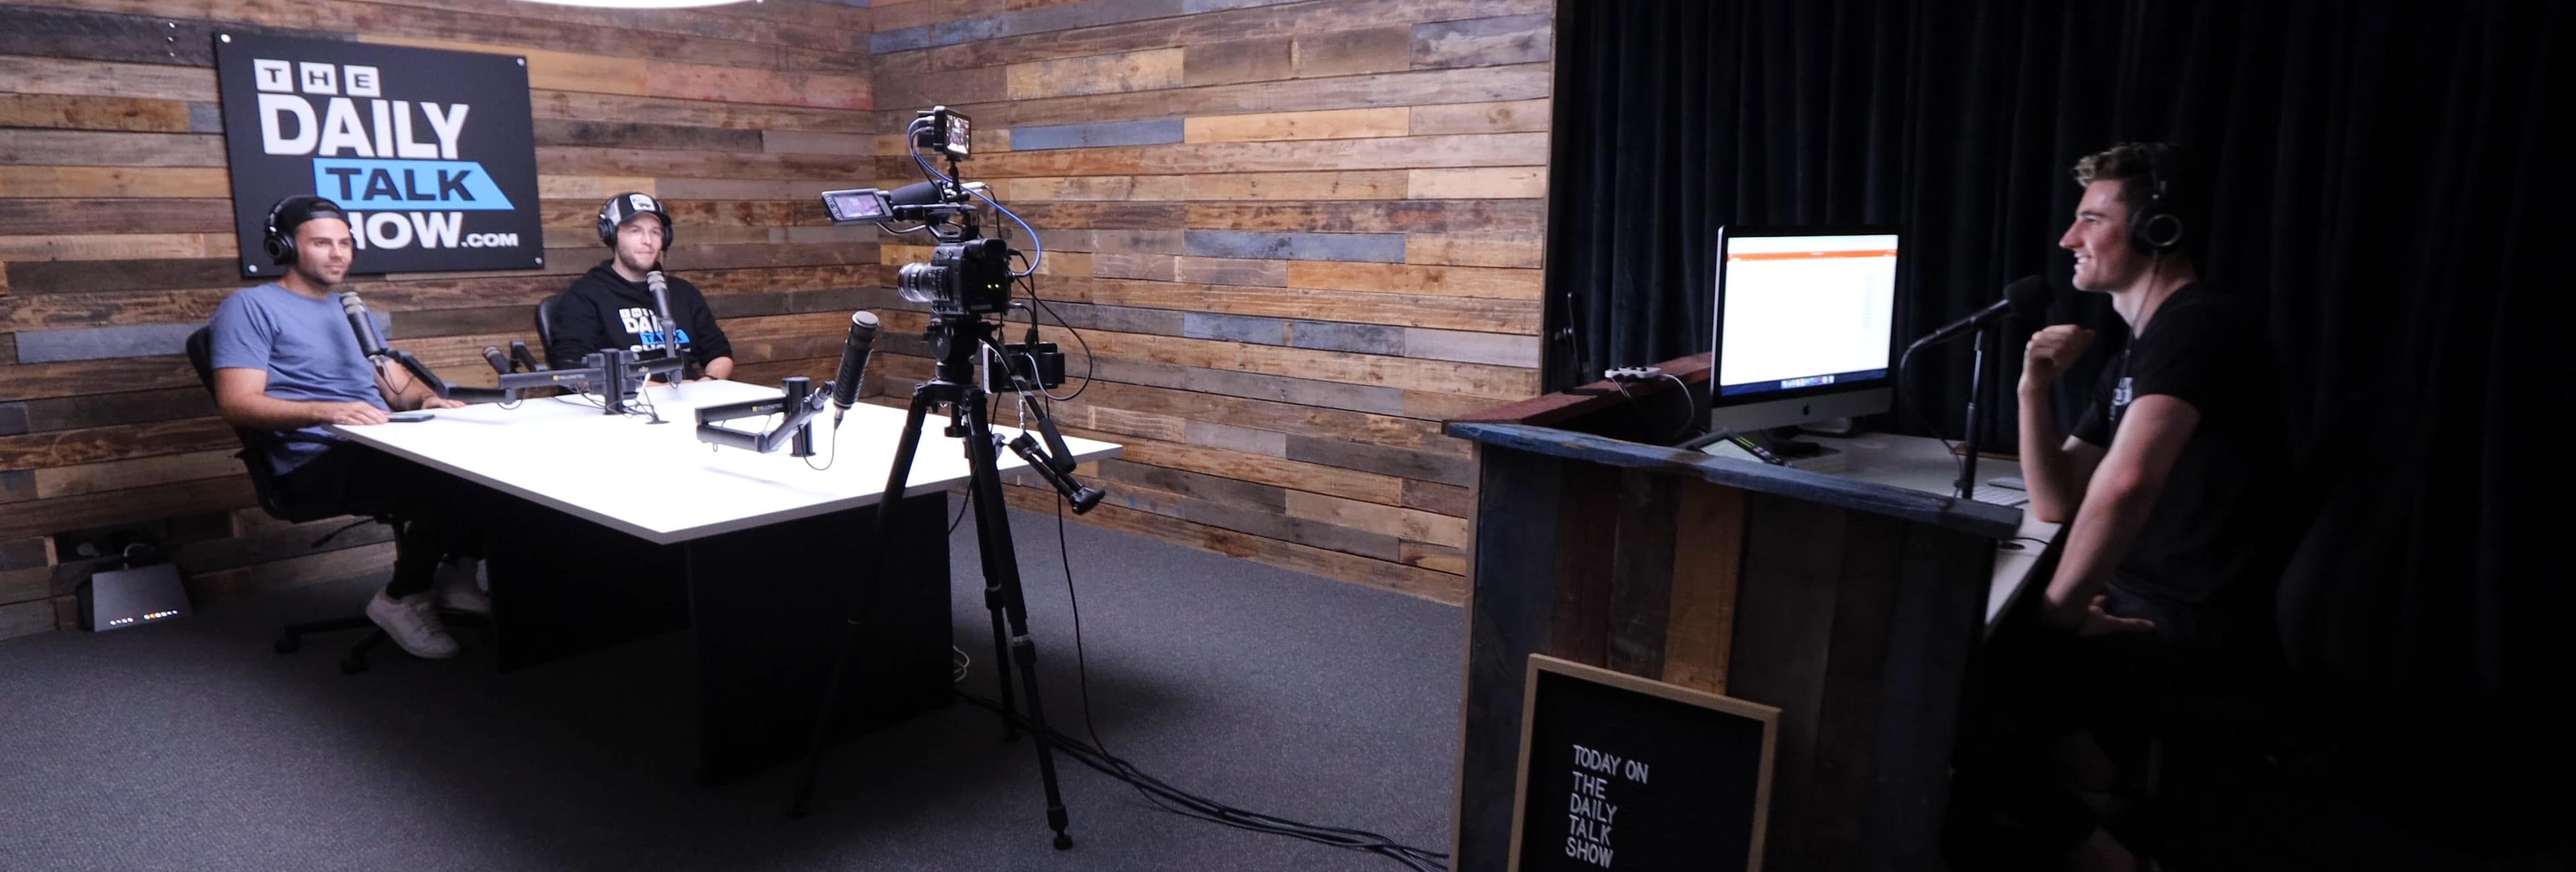 melbourne podcast studio